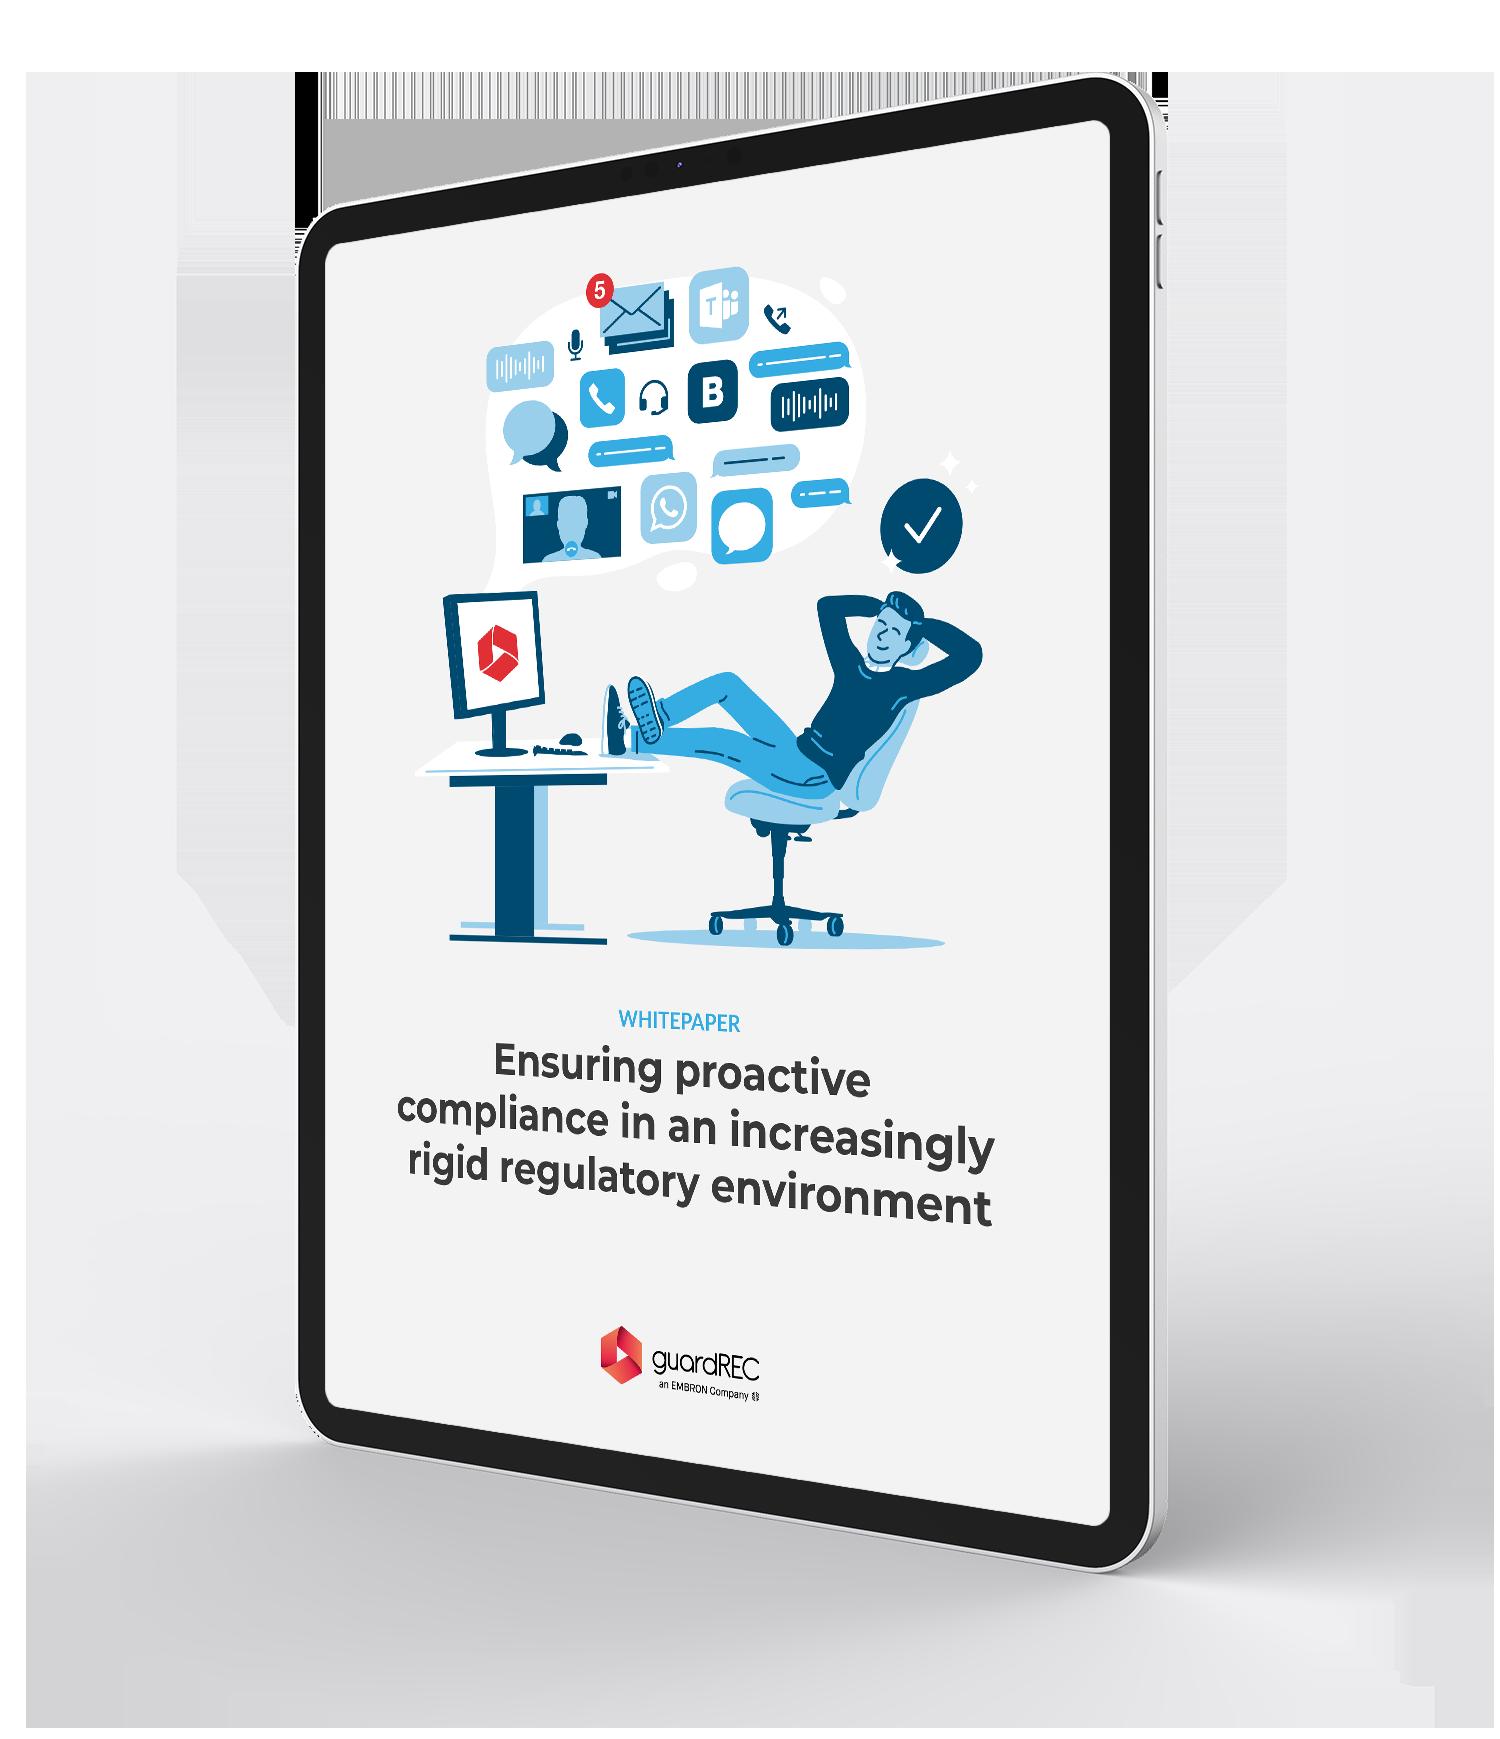 Ensuring proactive compliance in an increasingly rigid regulatory environment